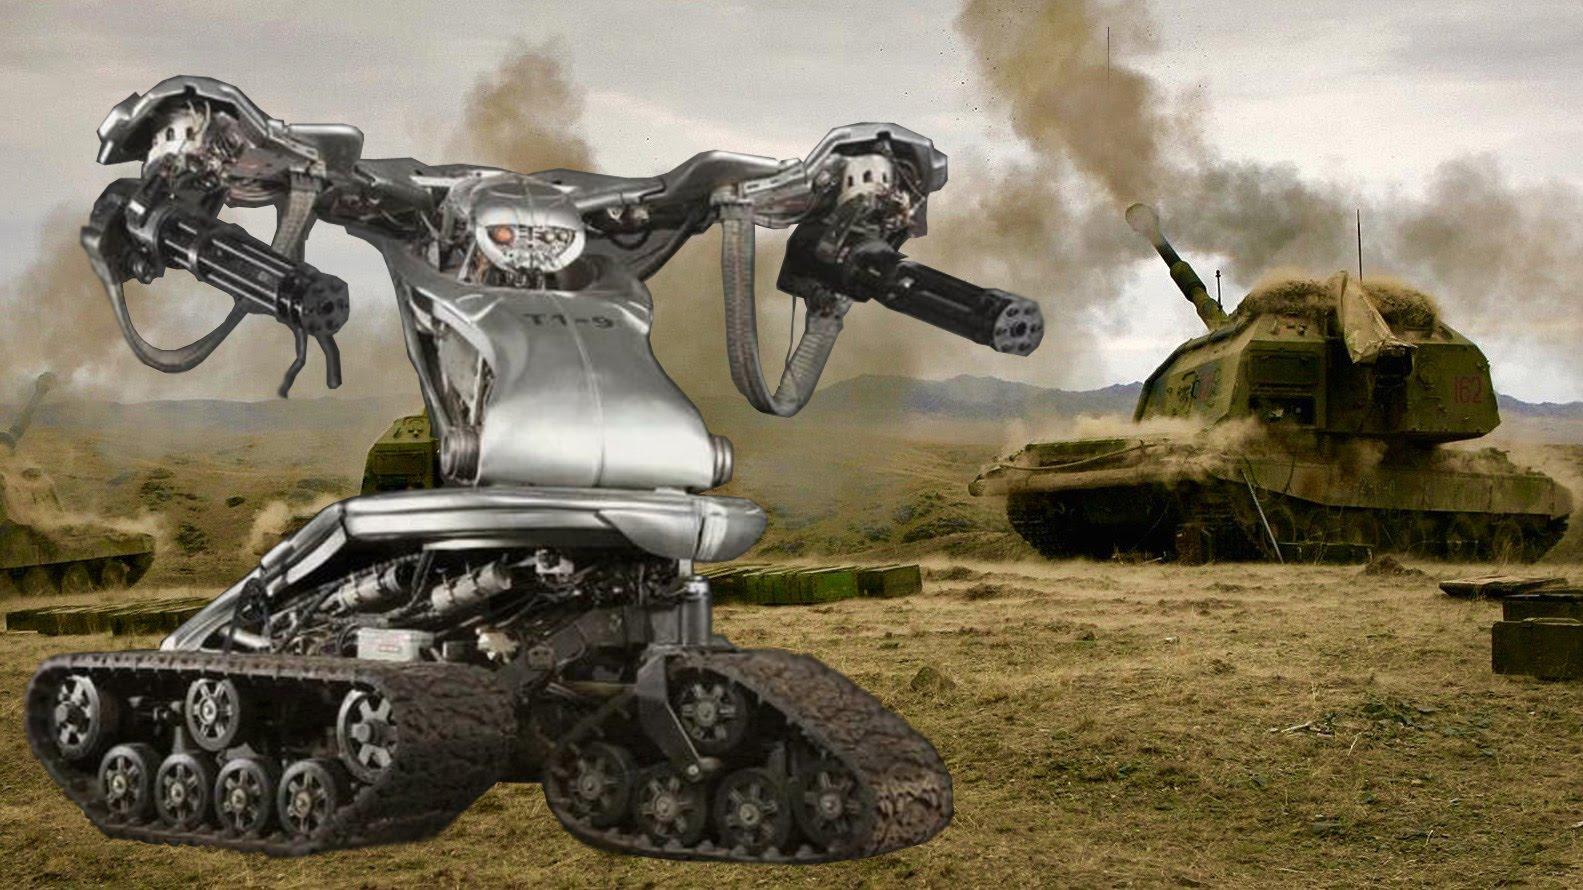 US Military Builds Top Secret Killer Terminator Robots